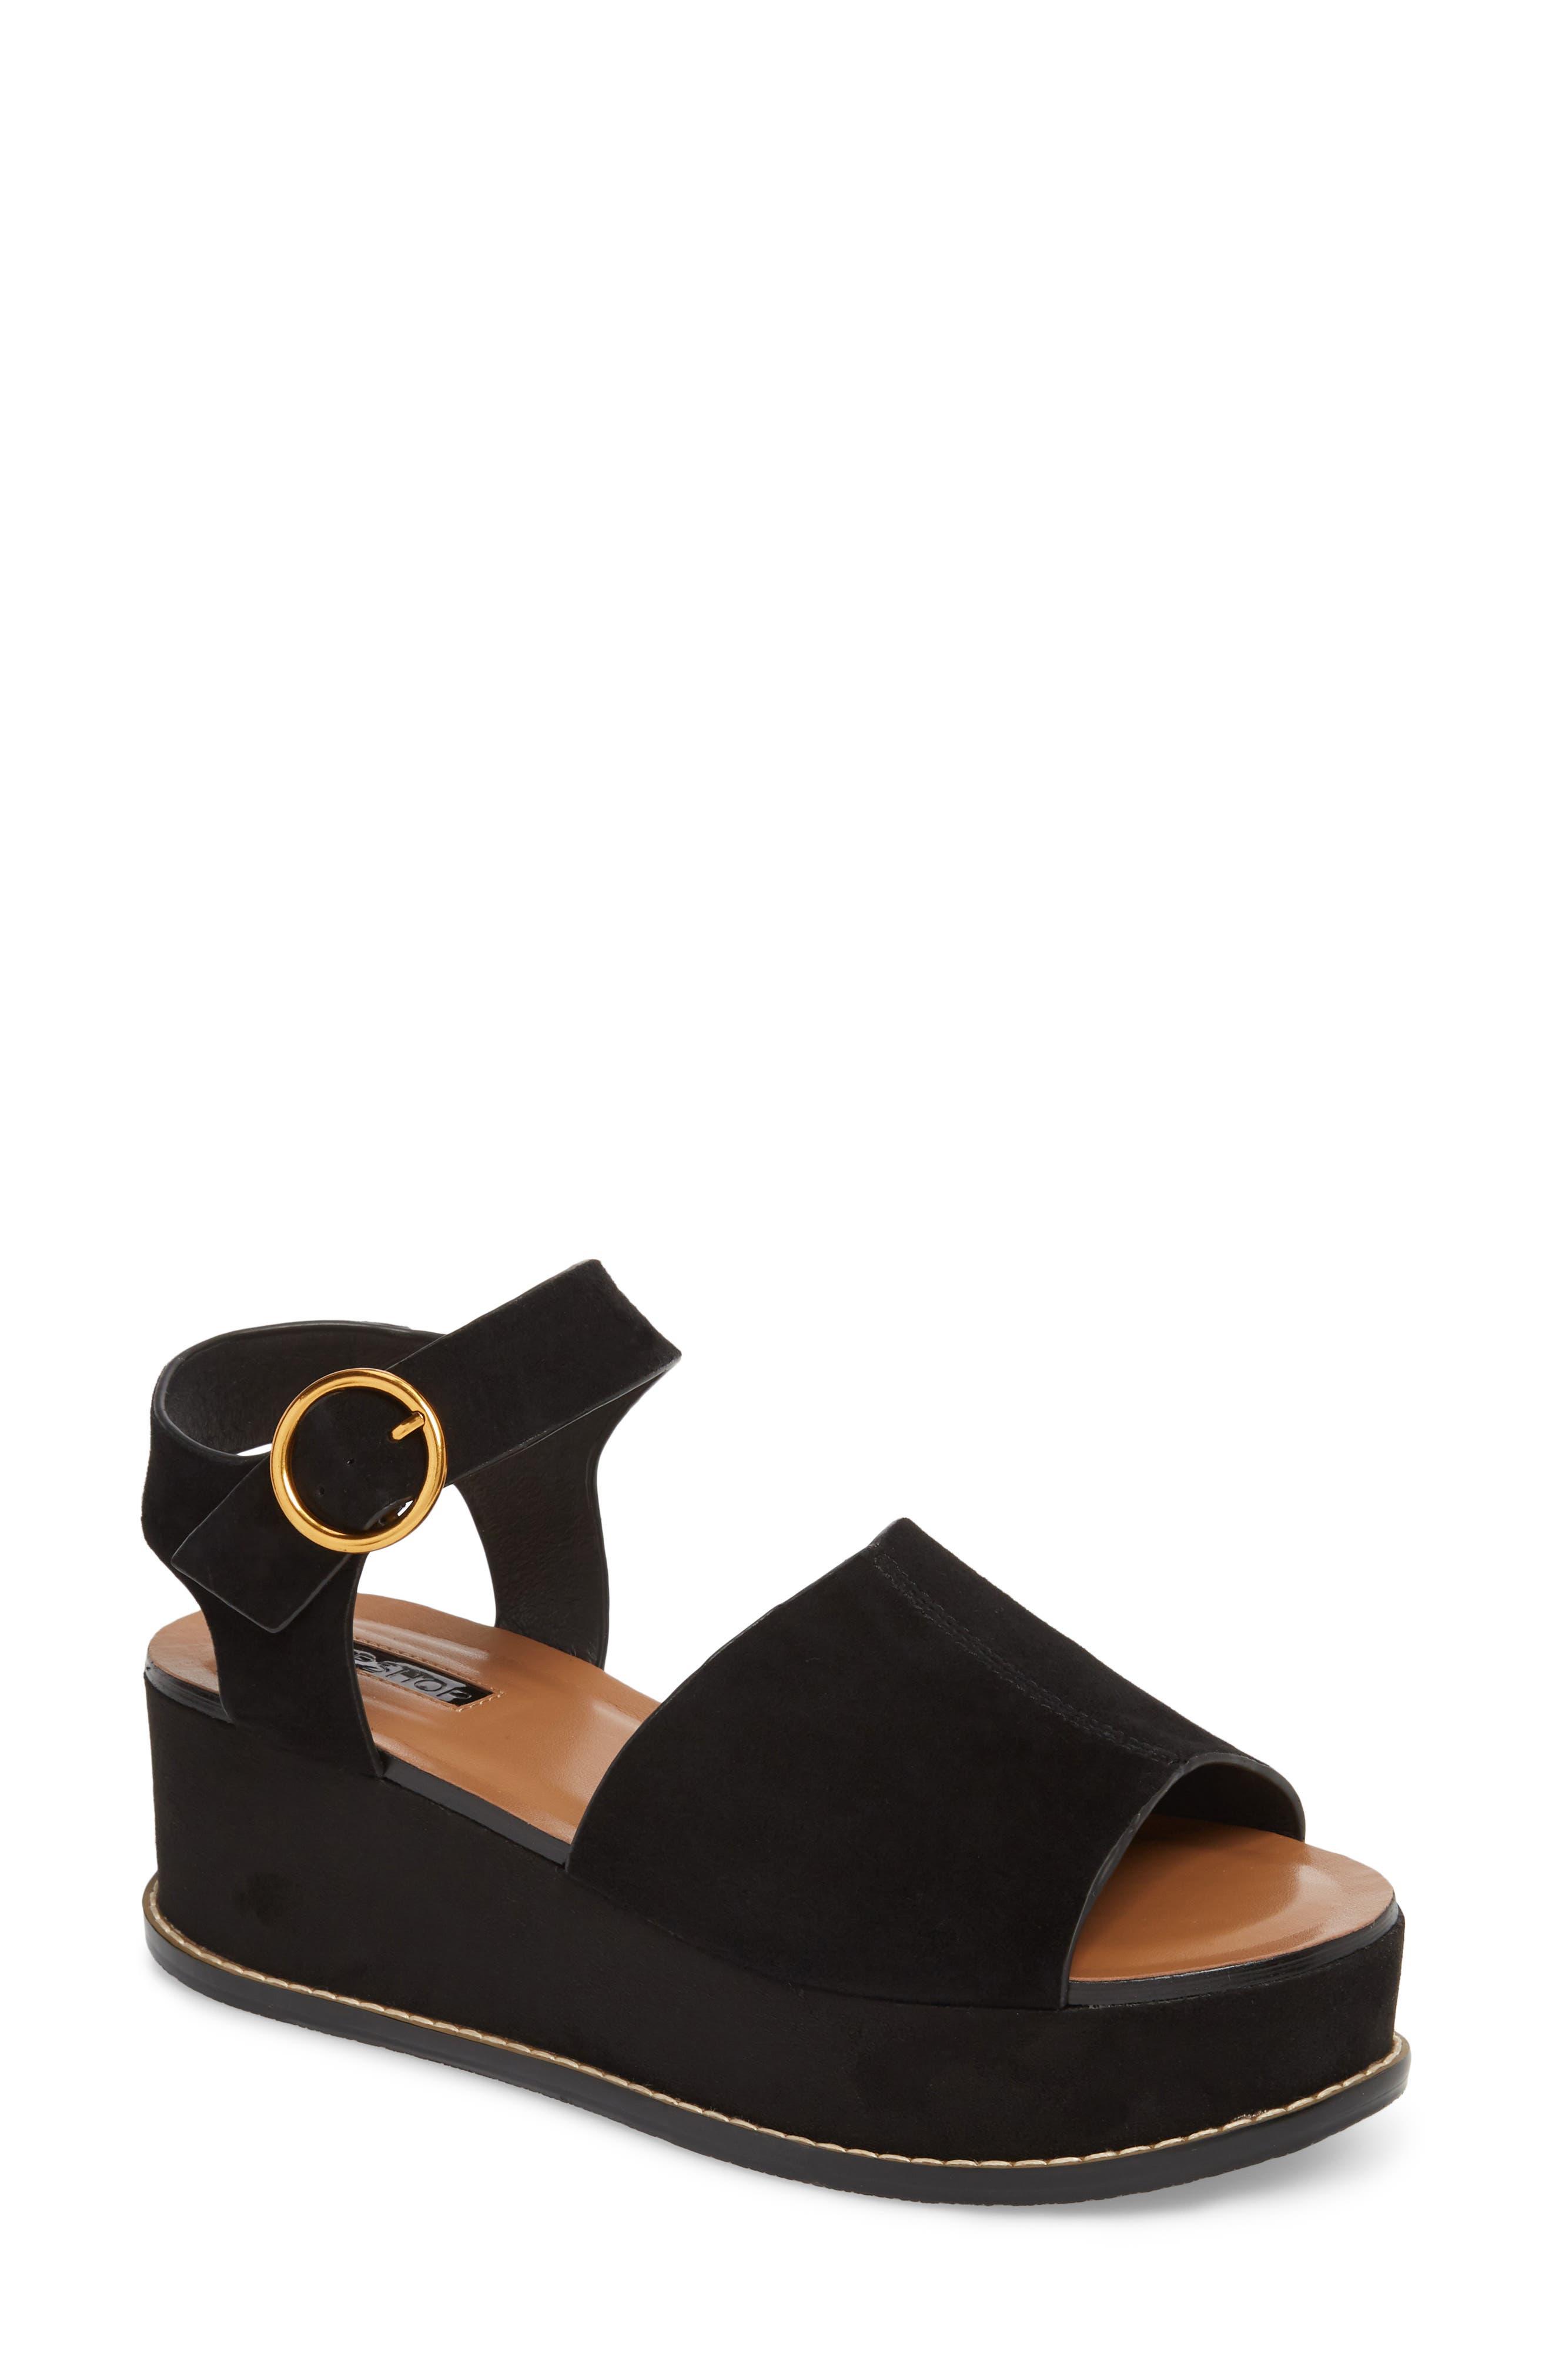 Wow Platform Wedge Sandal,                             Main thumbnail 1, color,                             Black